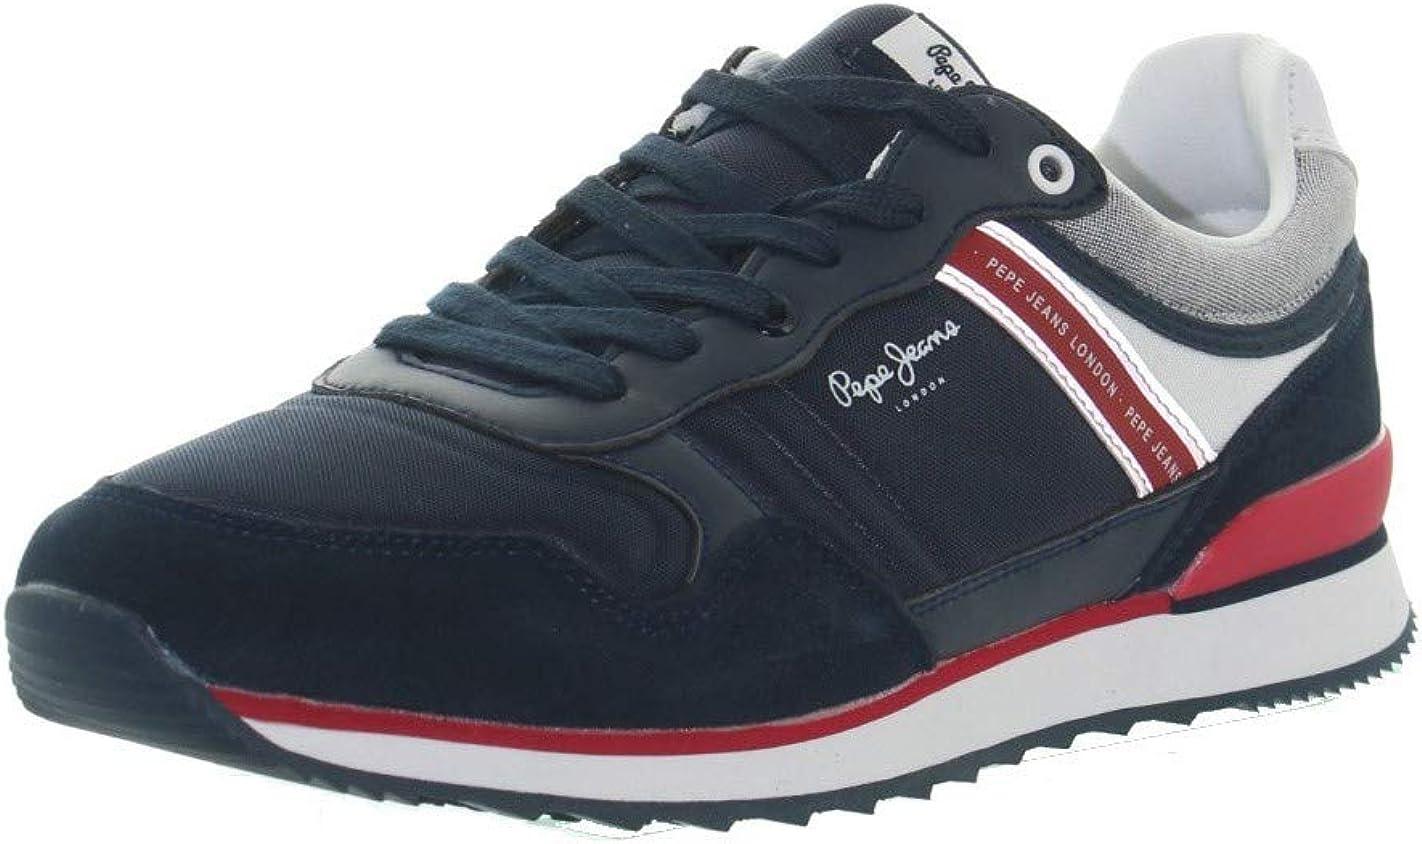 Pepe Jeans Cross 4 PMS 30607 Marino Zapatillas para Hombre